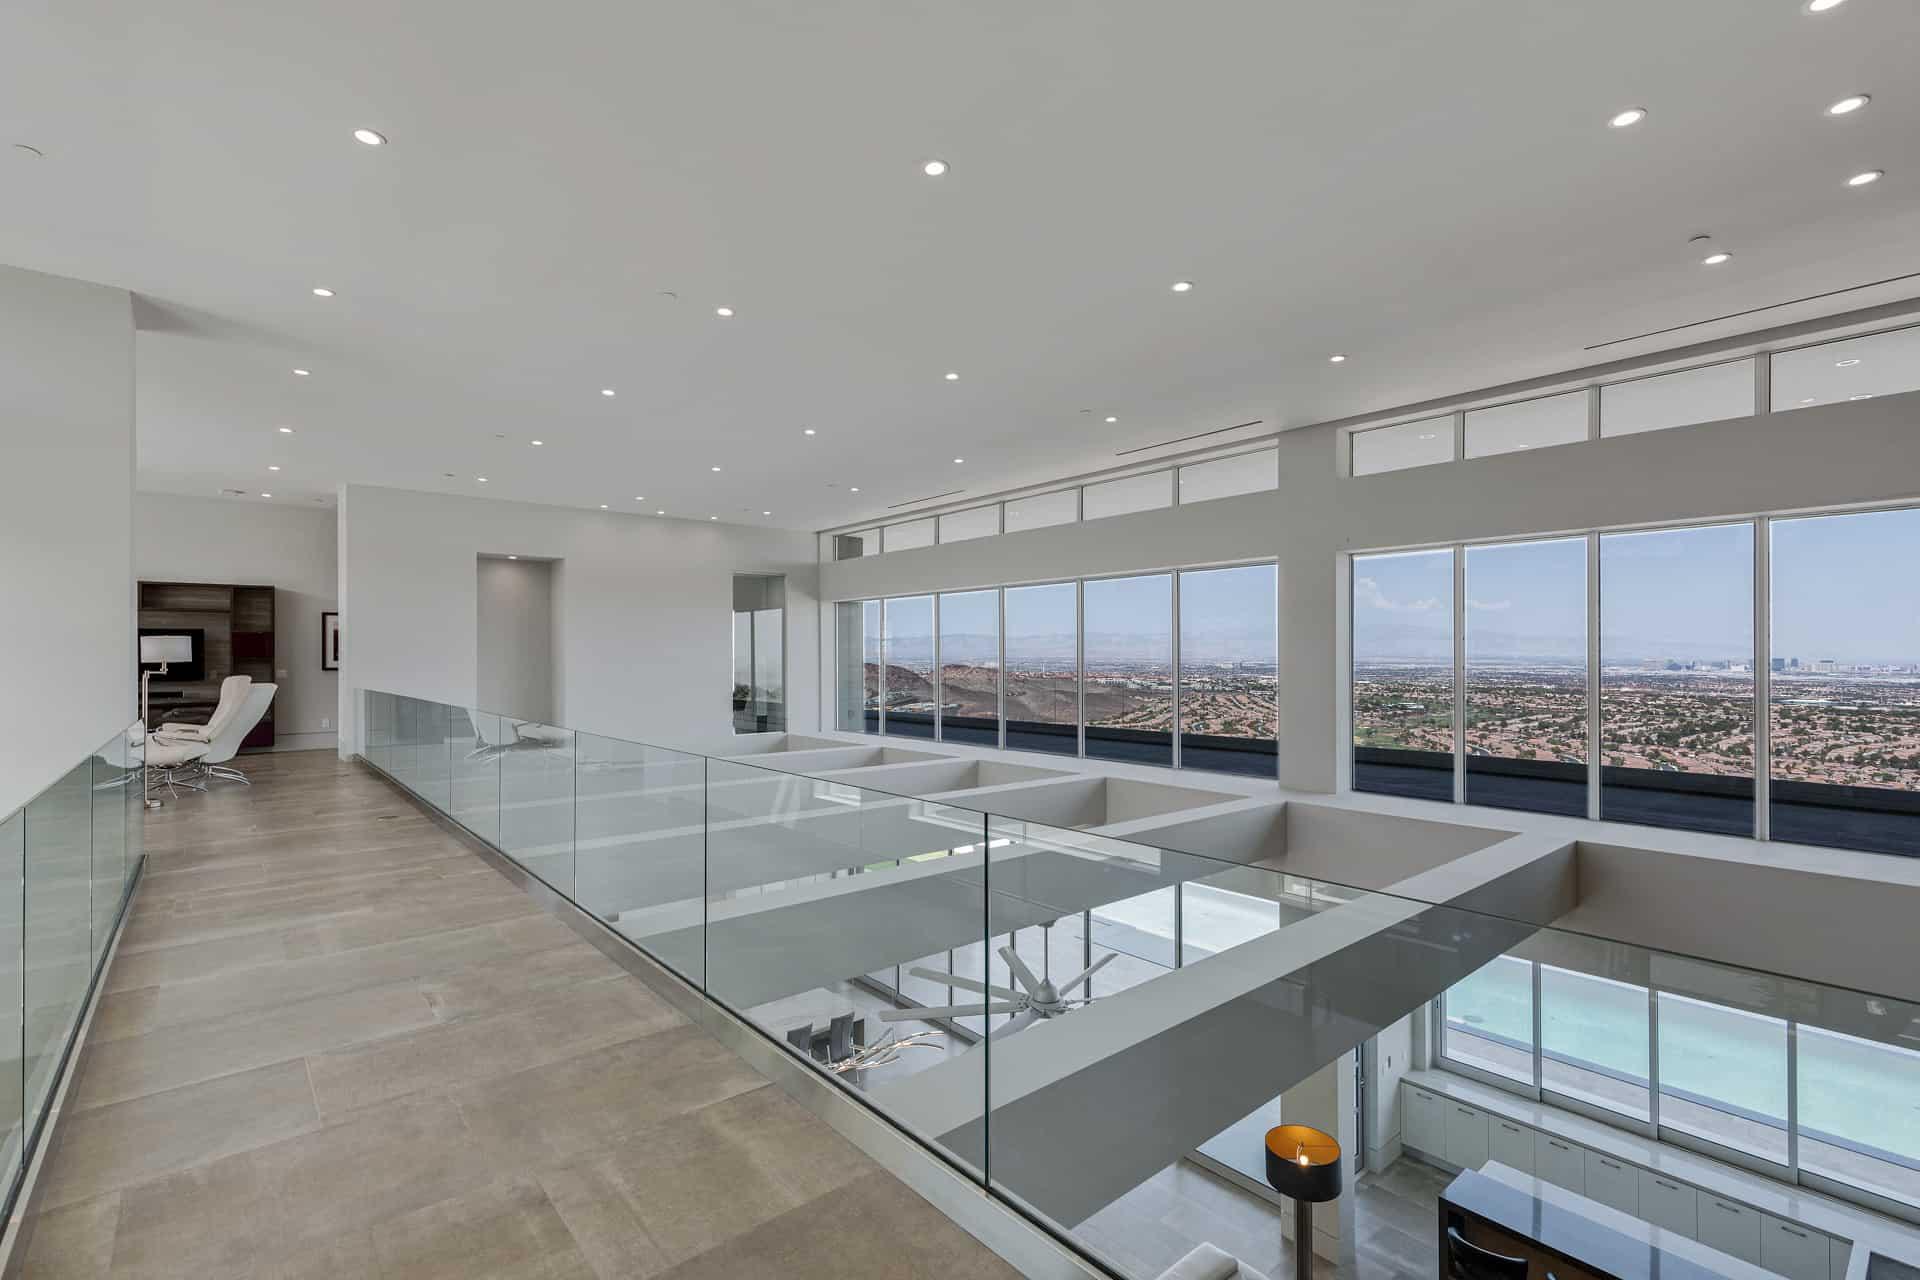 las-vegas-luxry-real-estate-realtor-rob-jensen-company-5-rockstream-drive-ascaya050